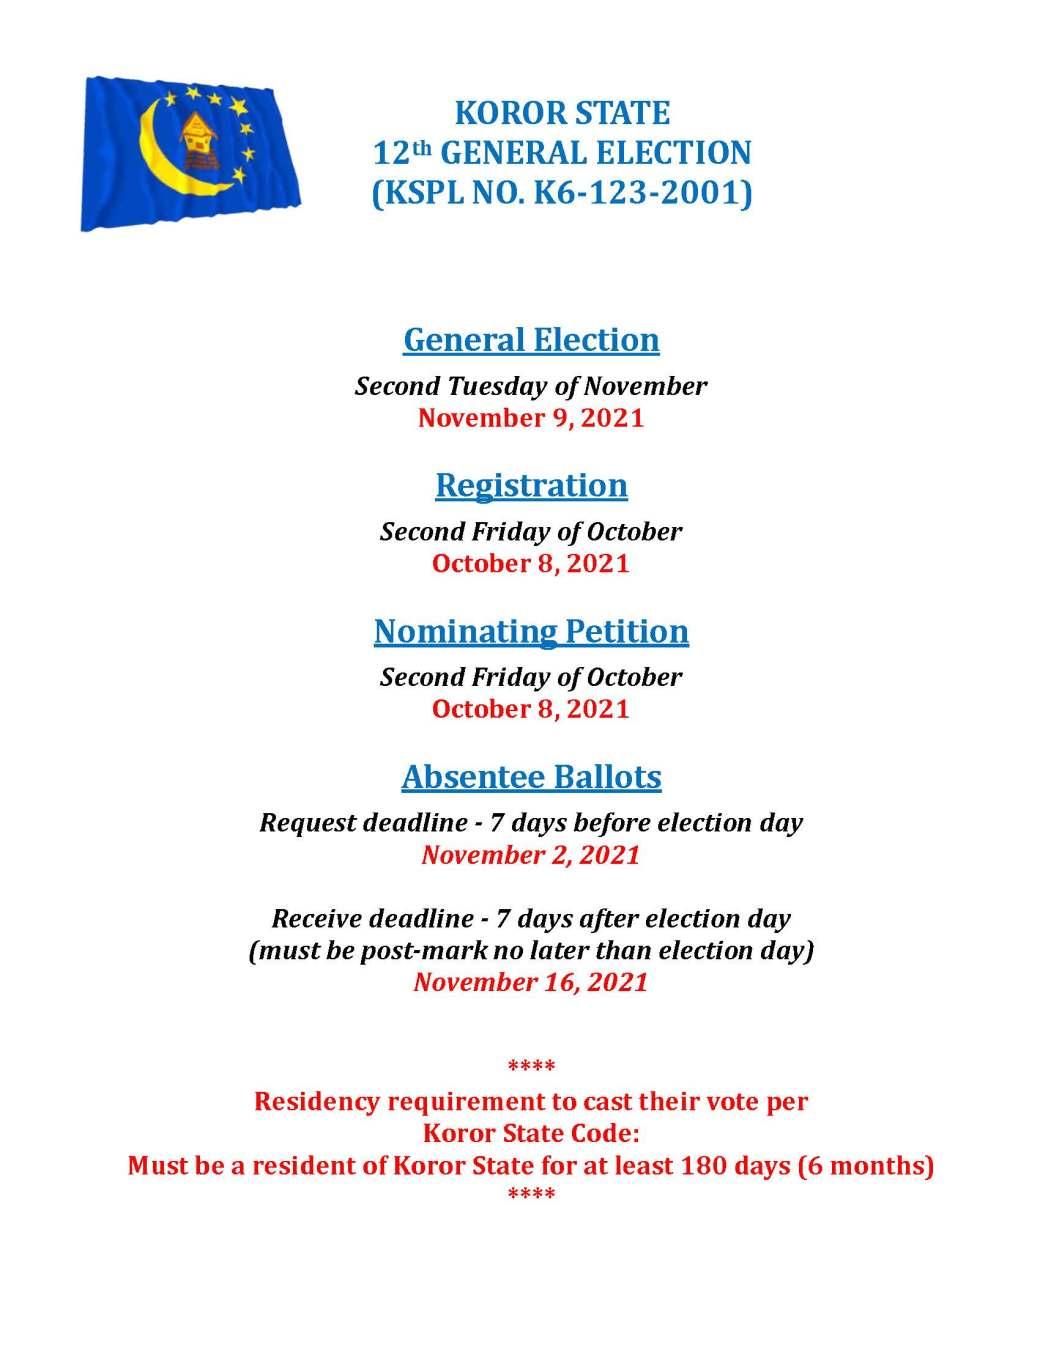 KOROR ELECTION DEADLINE DATES